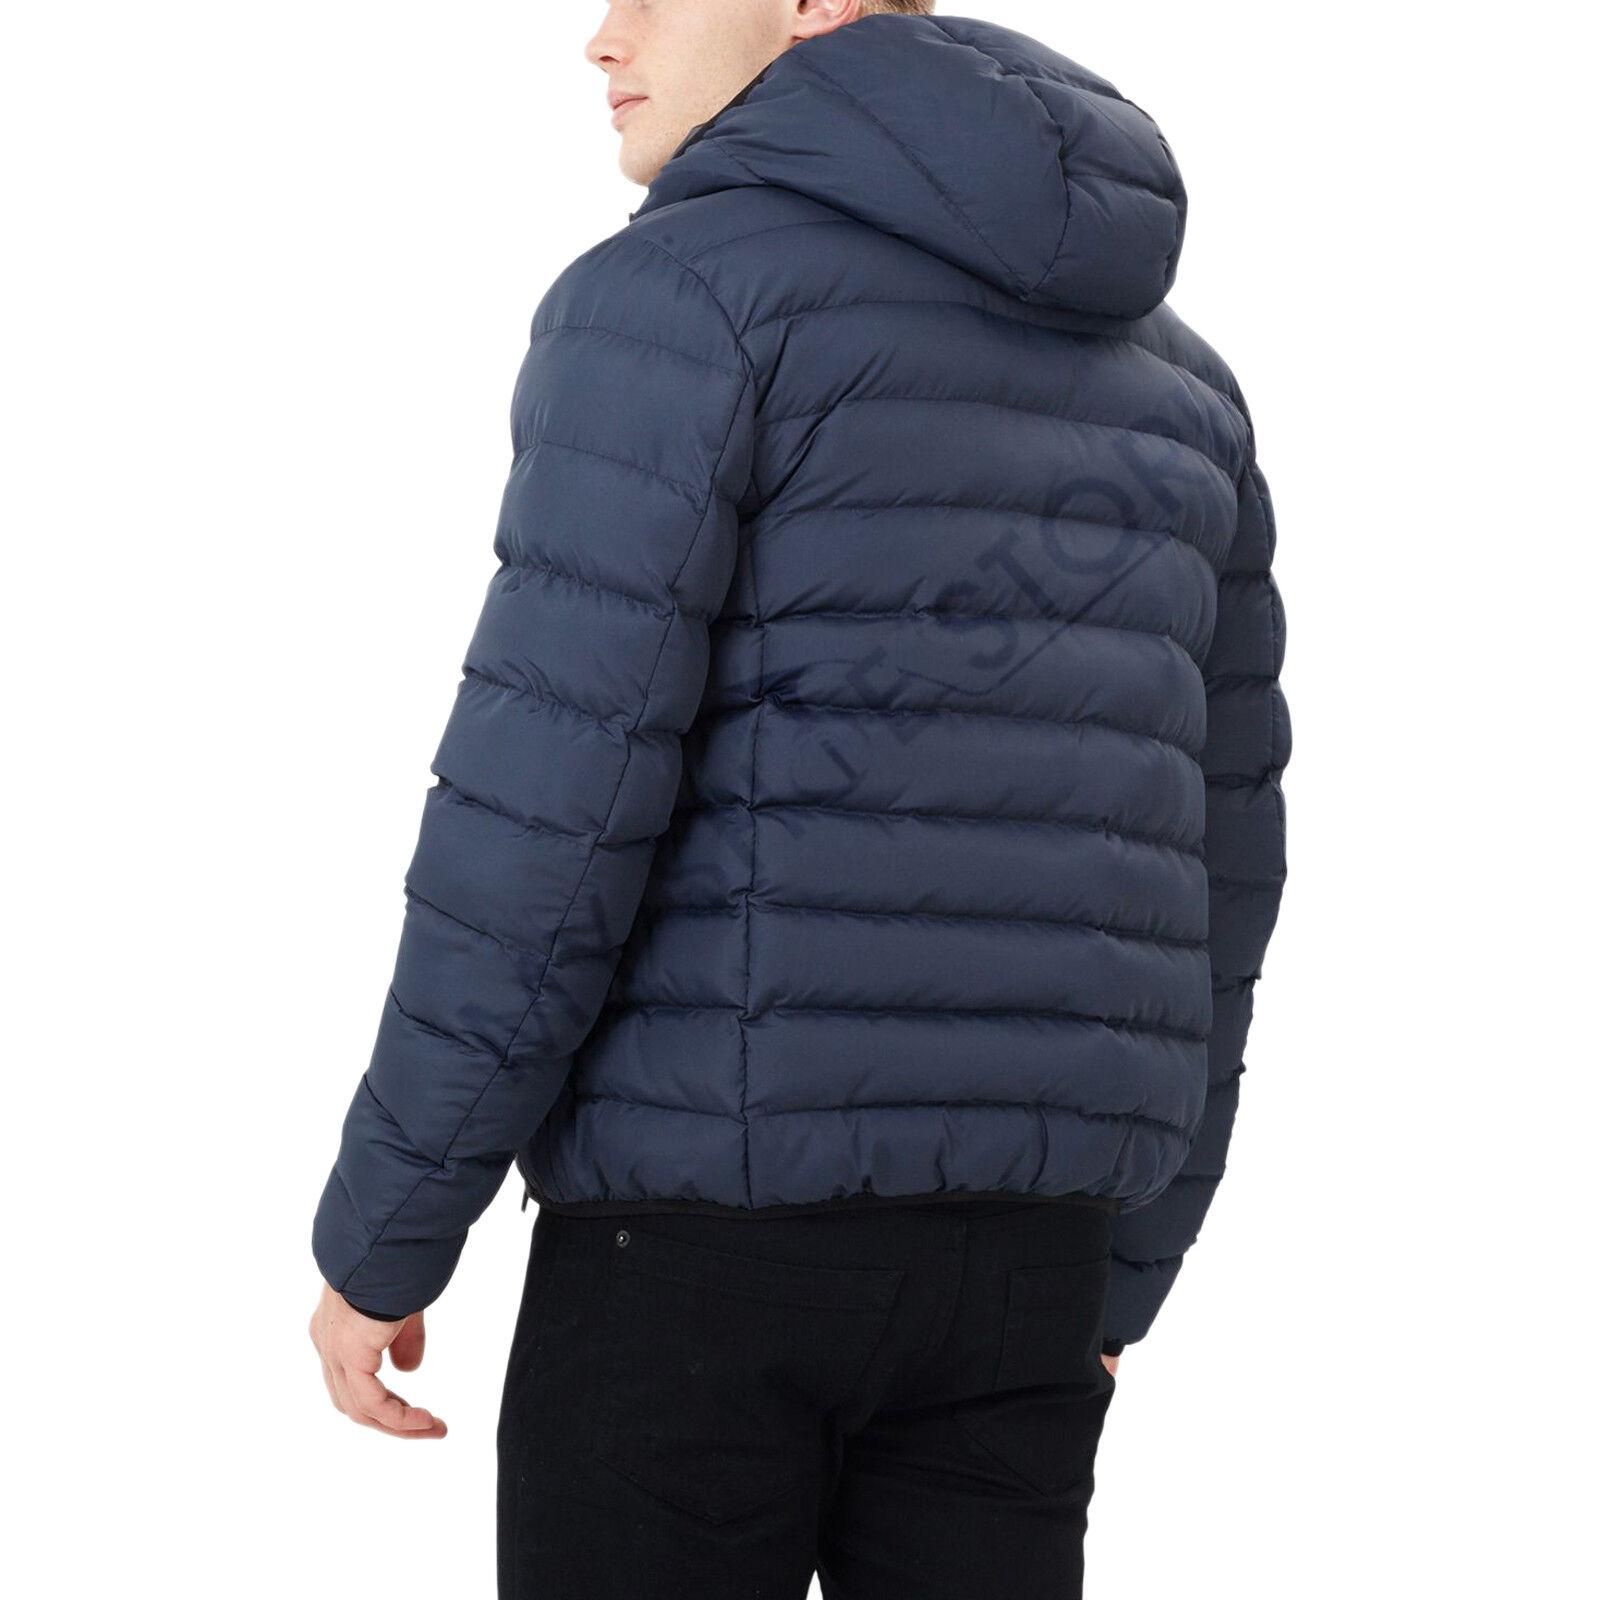 Buy adidas Womens Climaheat Icezeit Parka Jacket in   Get